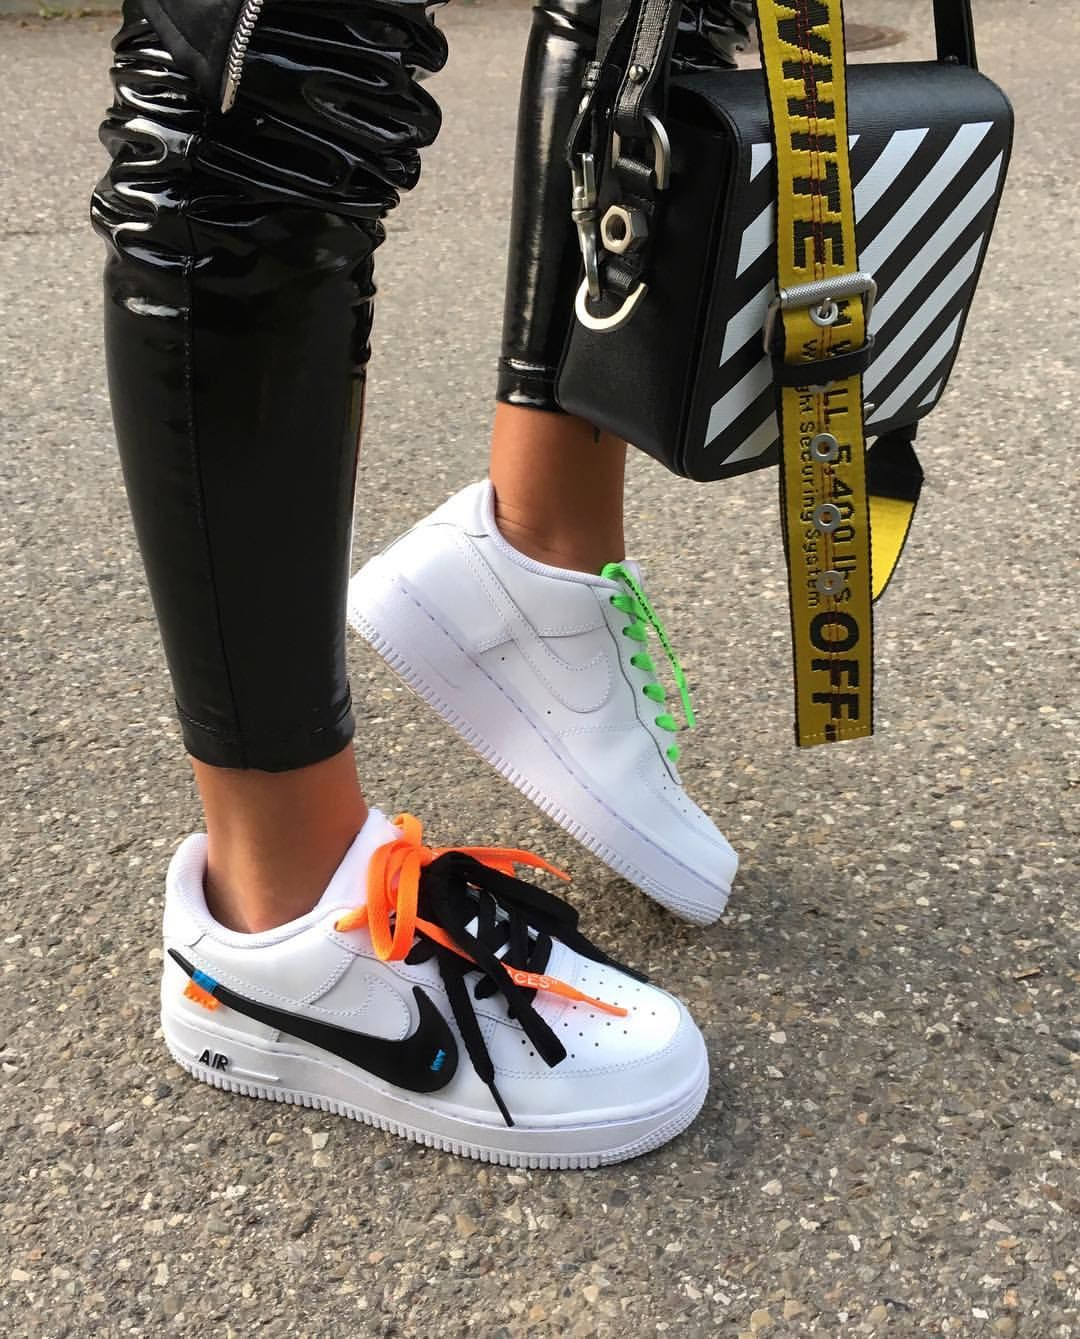 p i n t e r e s t @k.negron Off white x Nike collab | Hype